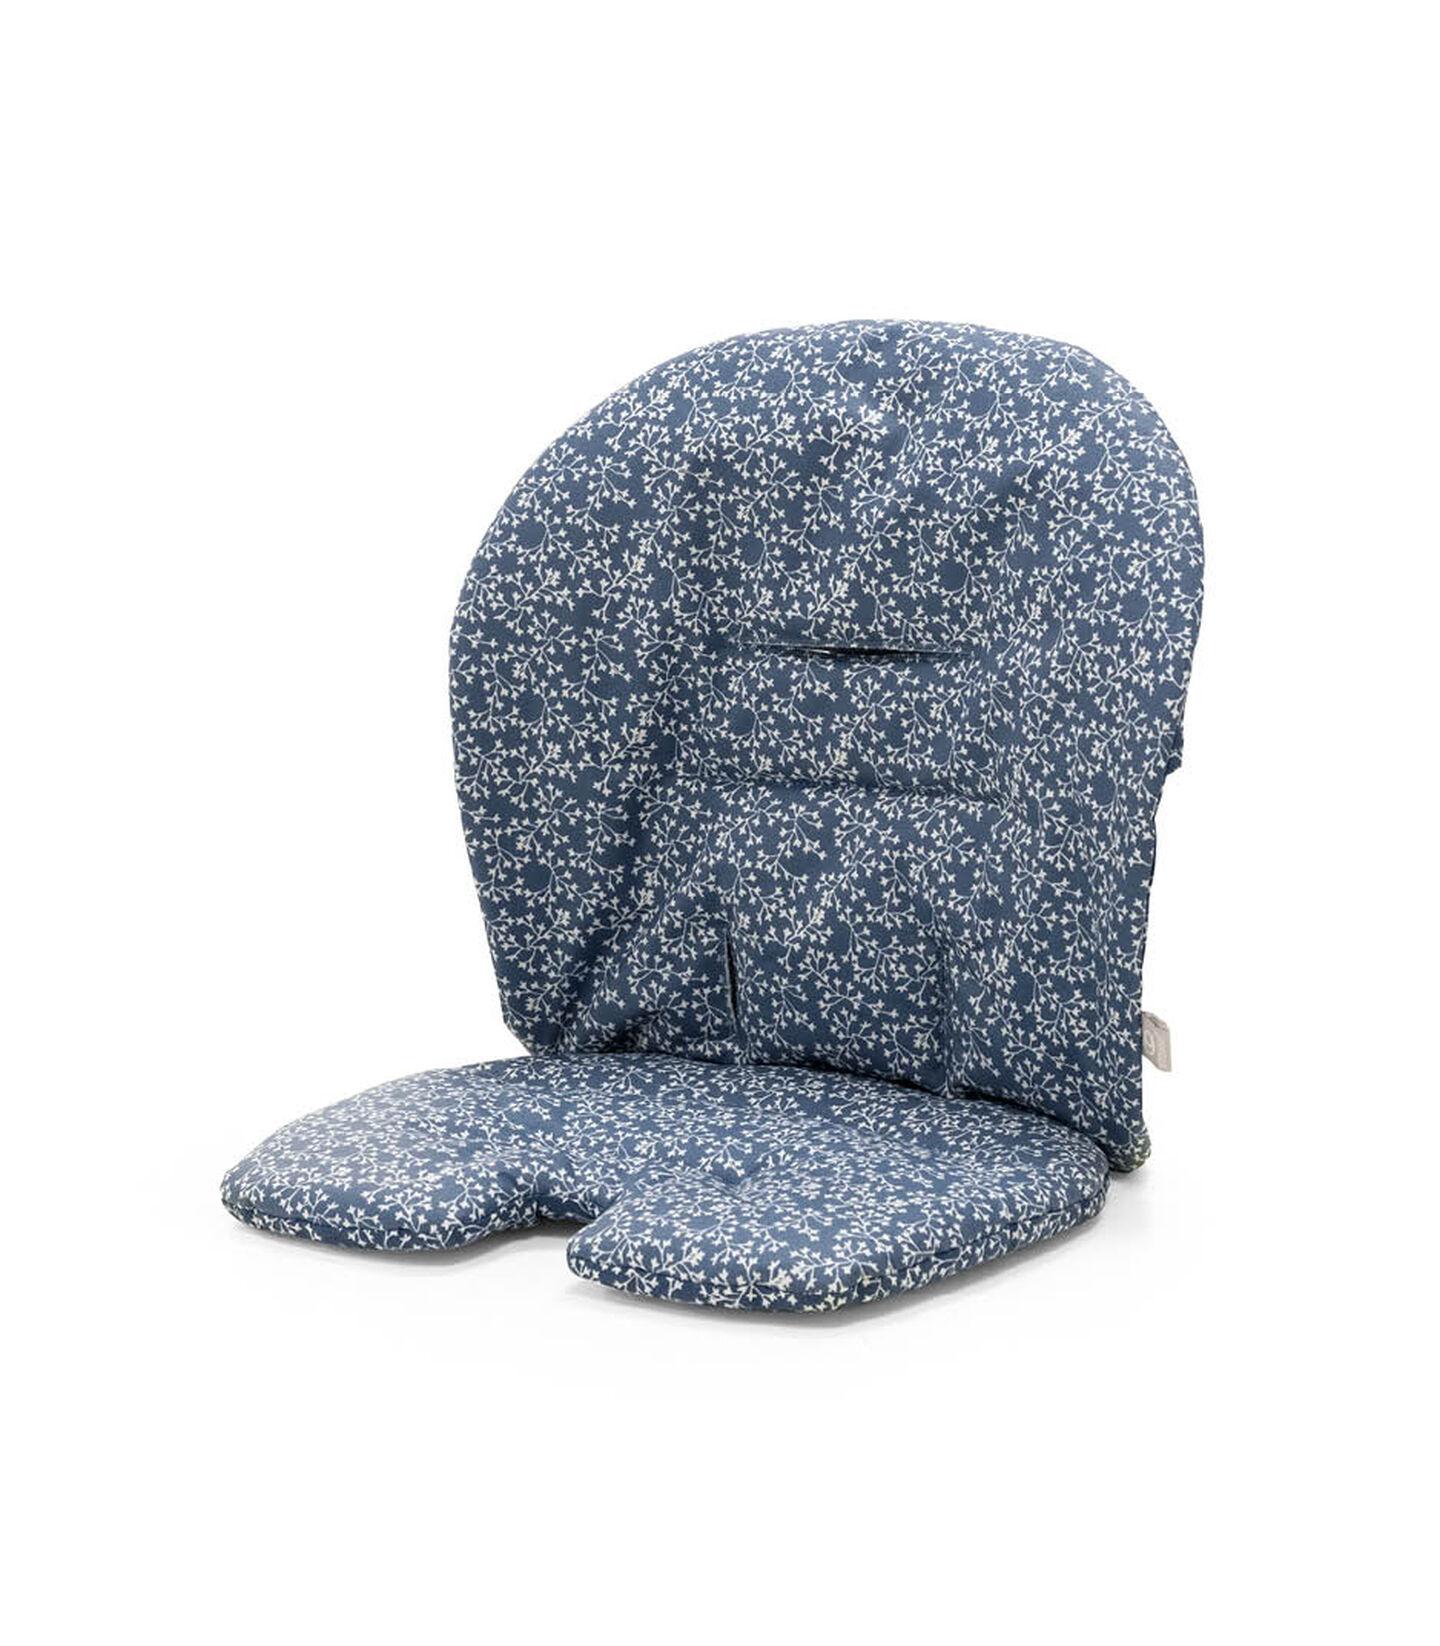 Stokke® Steps™ Accessories. Baby Set Cushion. Flower Garden. view 2